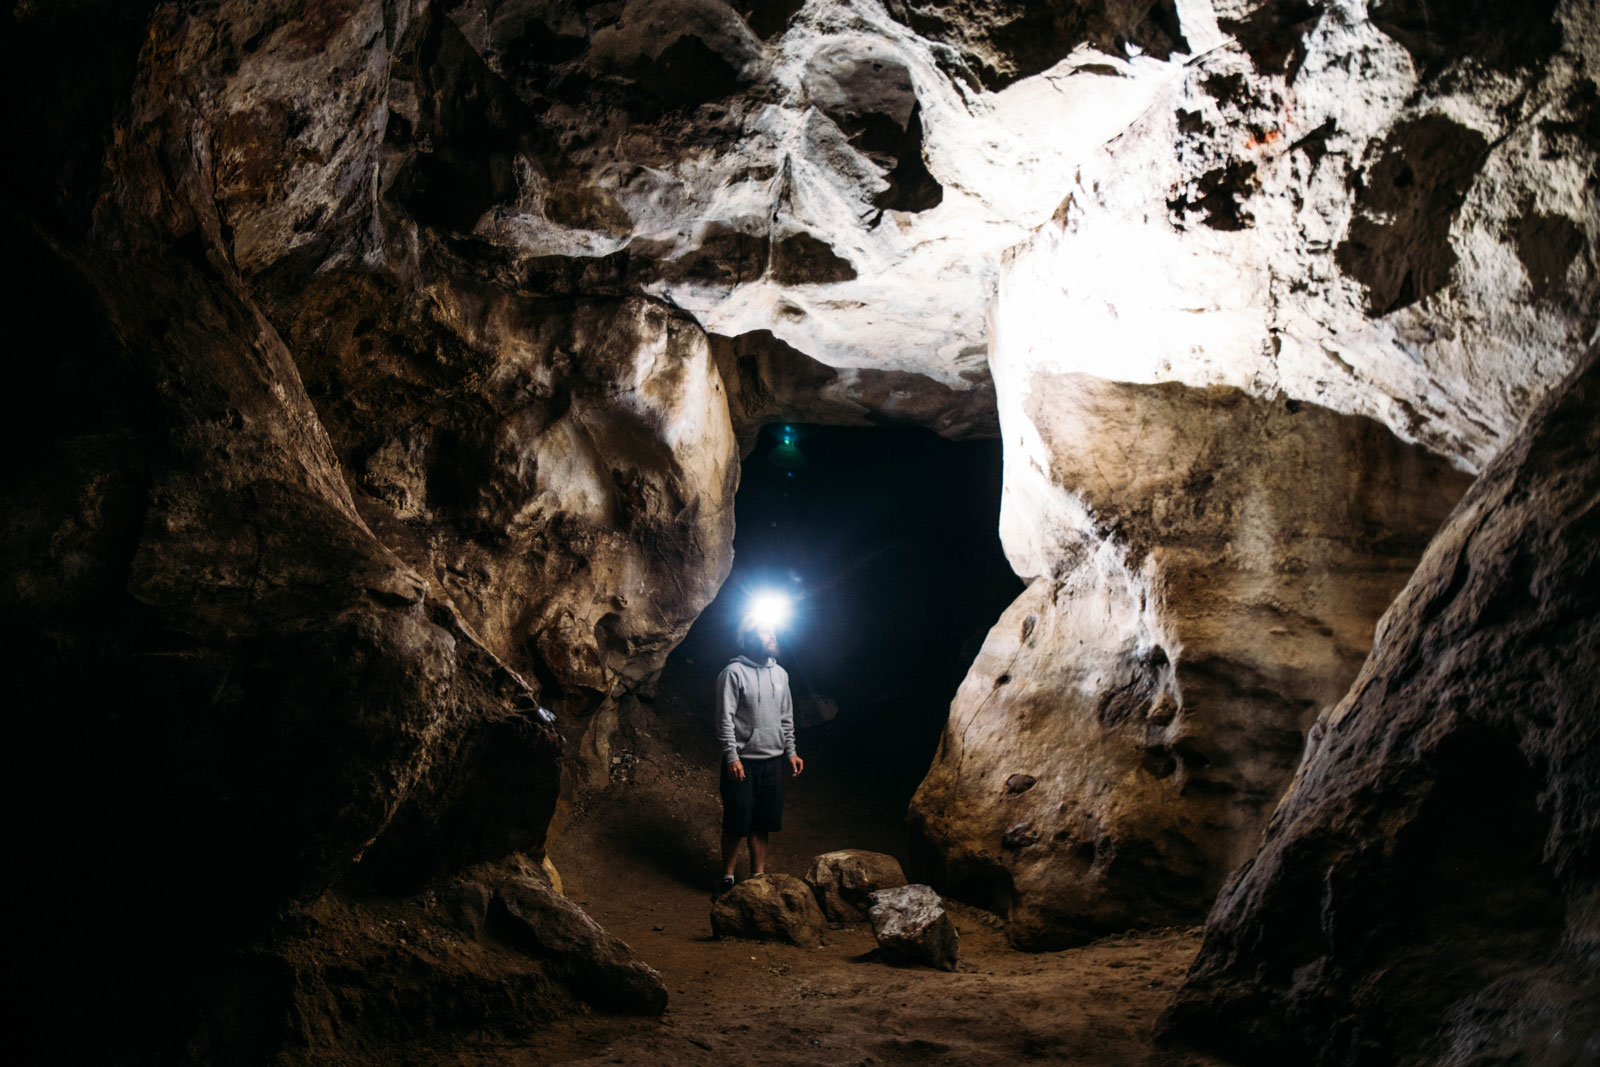 visiter l'intérieur caverne naturelle